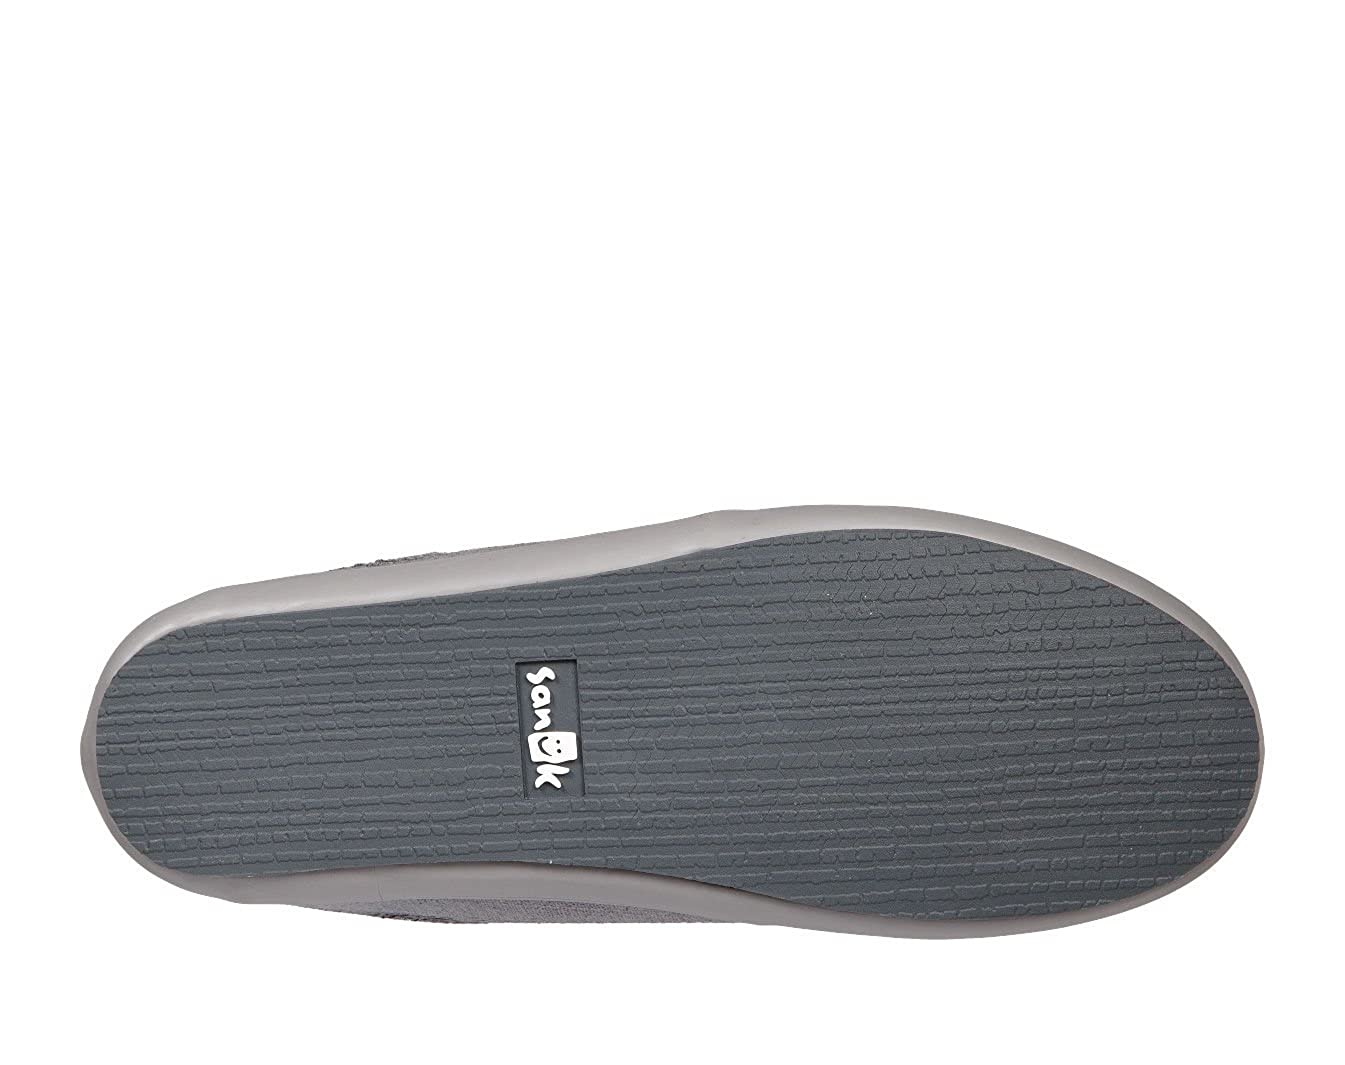 Sanuk Mens TKO Shoe Dark Charcoal 12 /& Oxy Cleaner Bundle